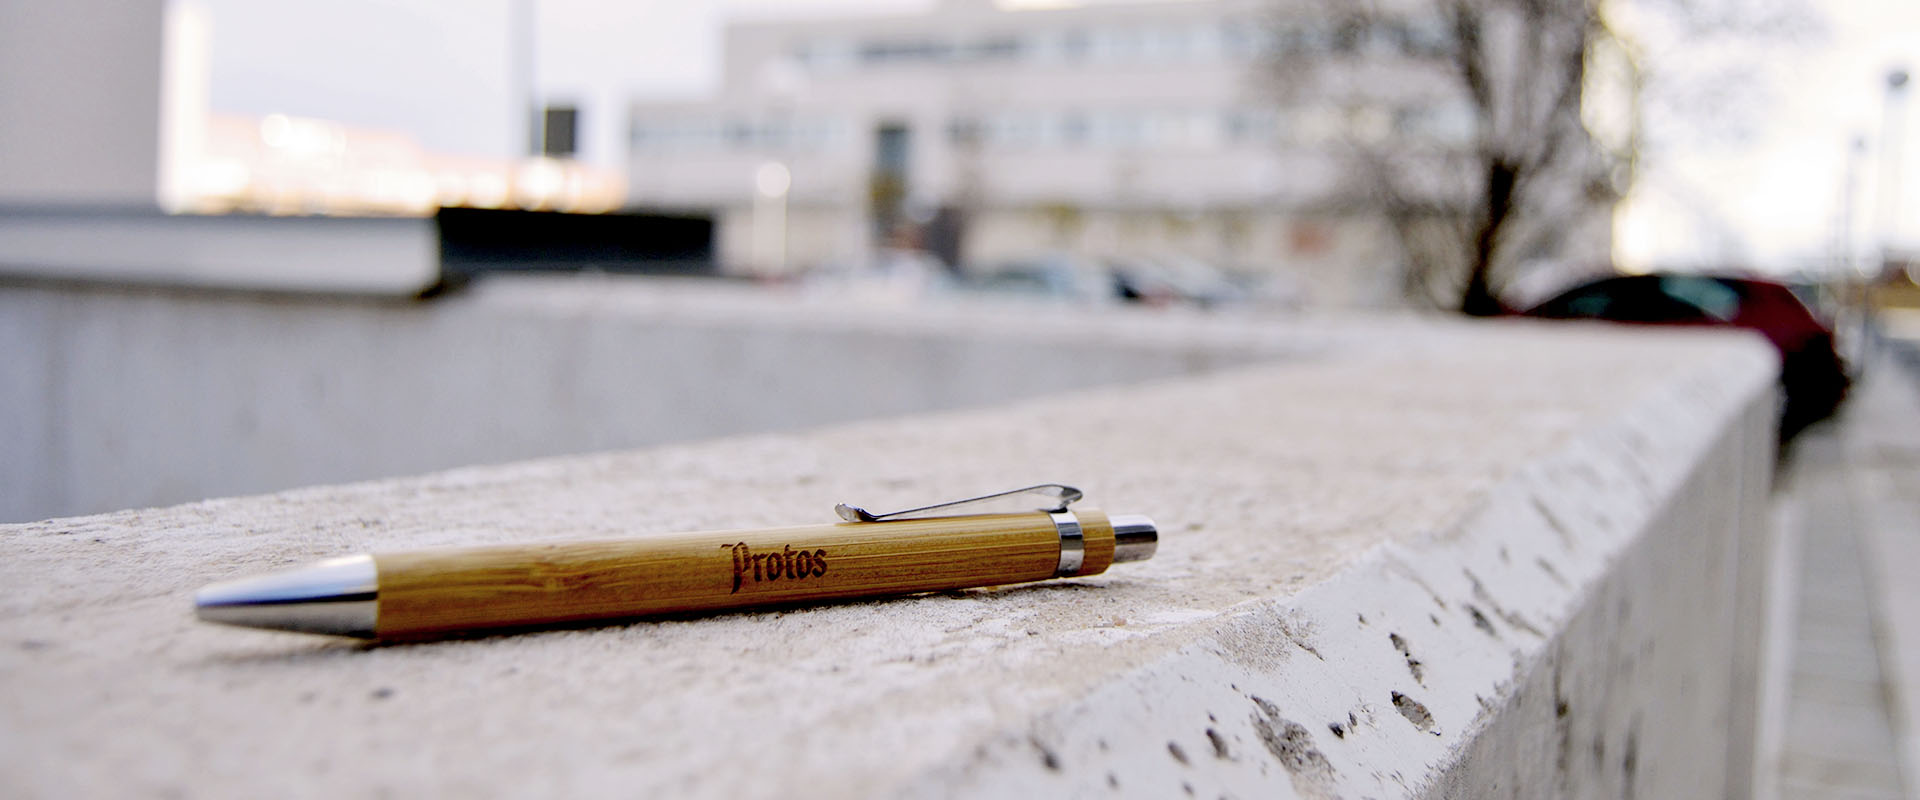 Bolígrafo para publicidad de Bodegas Protos